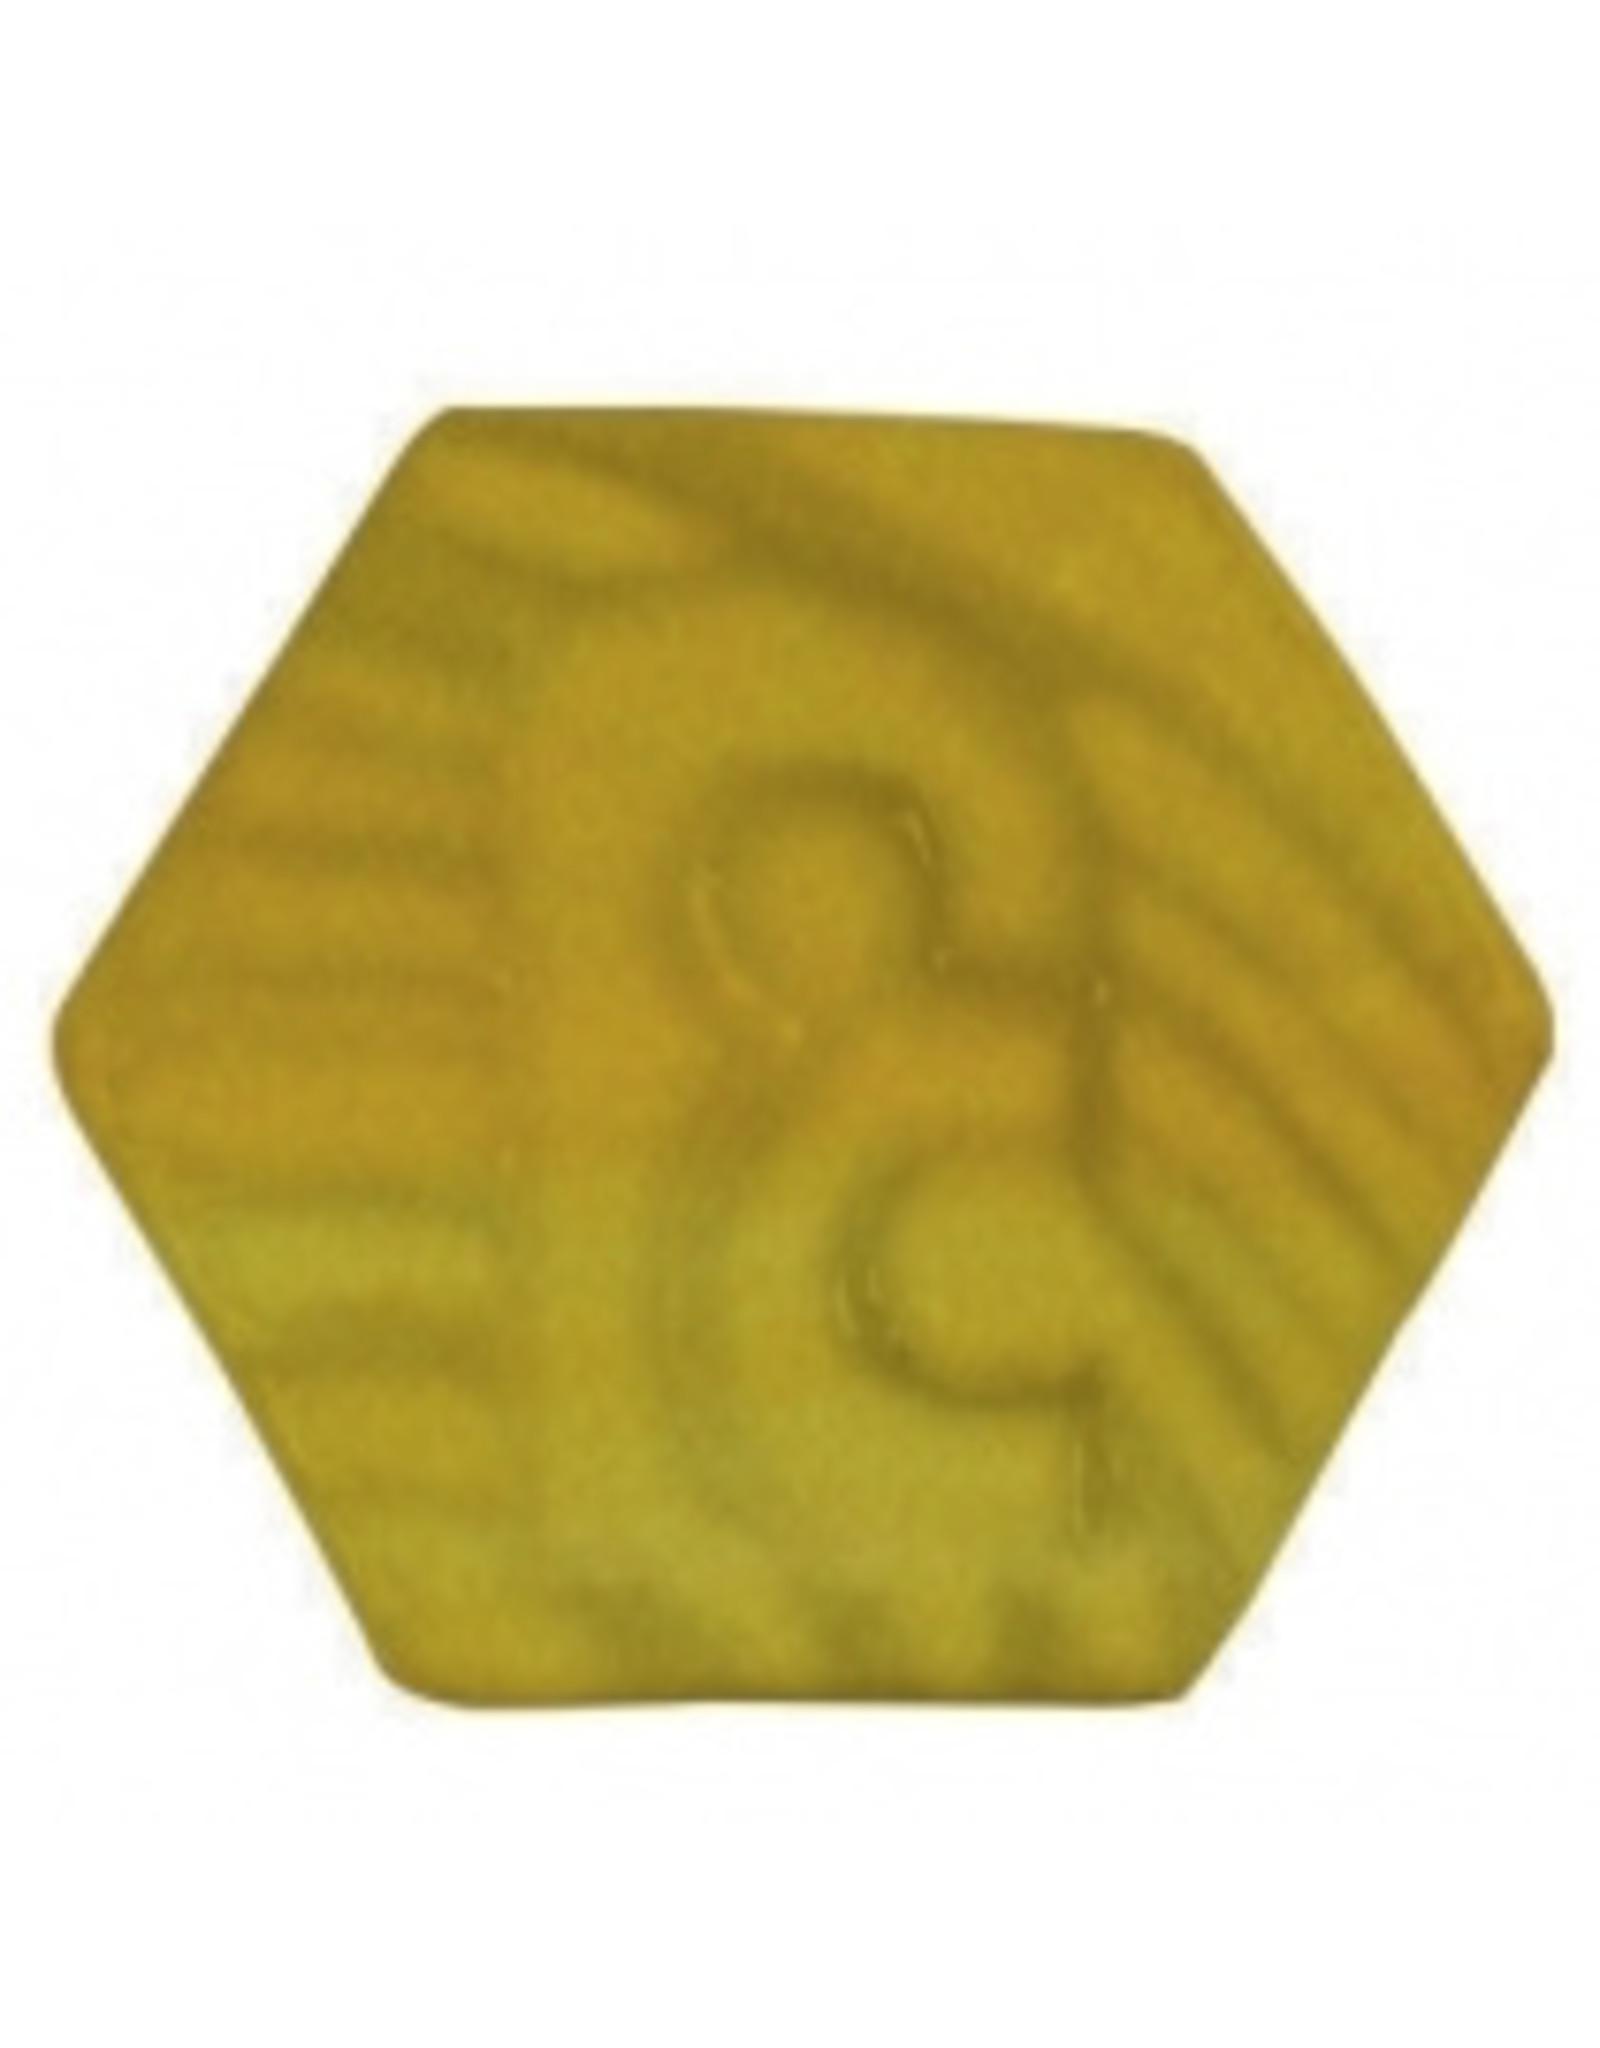 Potterycrafts Bright Yellow On-Glaze - 15ml